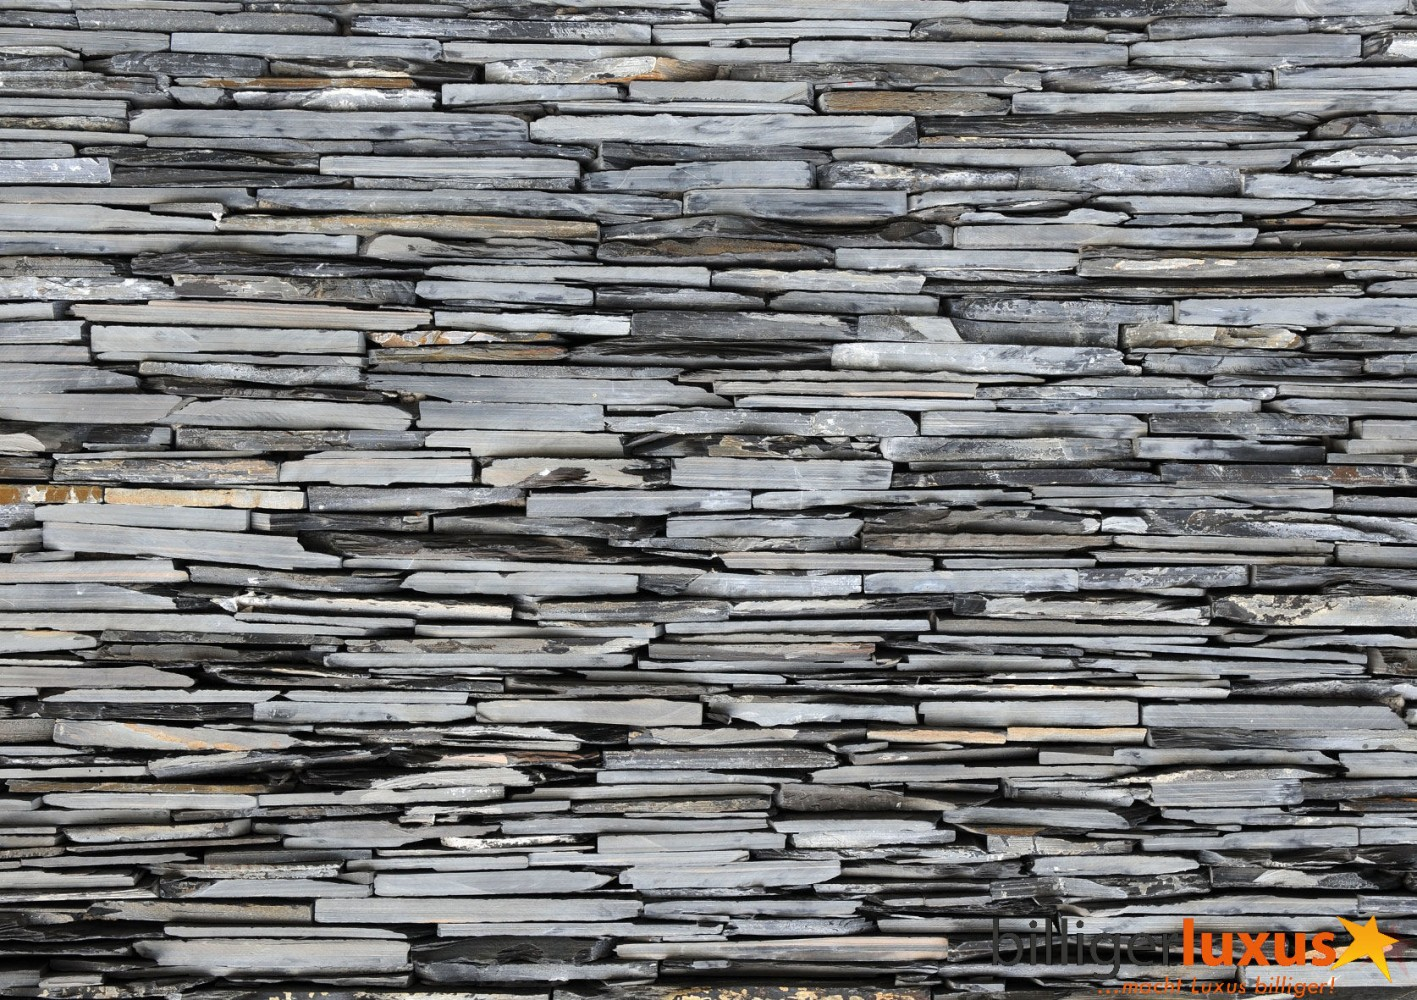 Wall mural wallpaper stone wall stones grey photo 360 cm x 254 cm 3 1417x1000